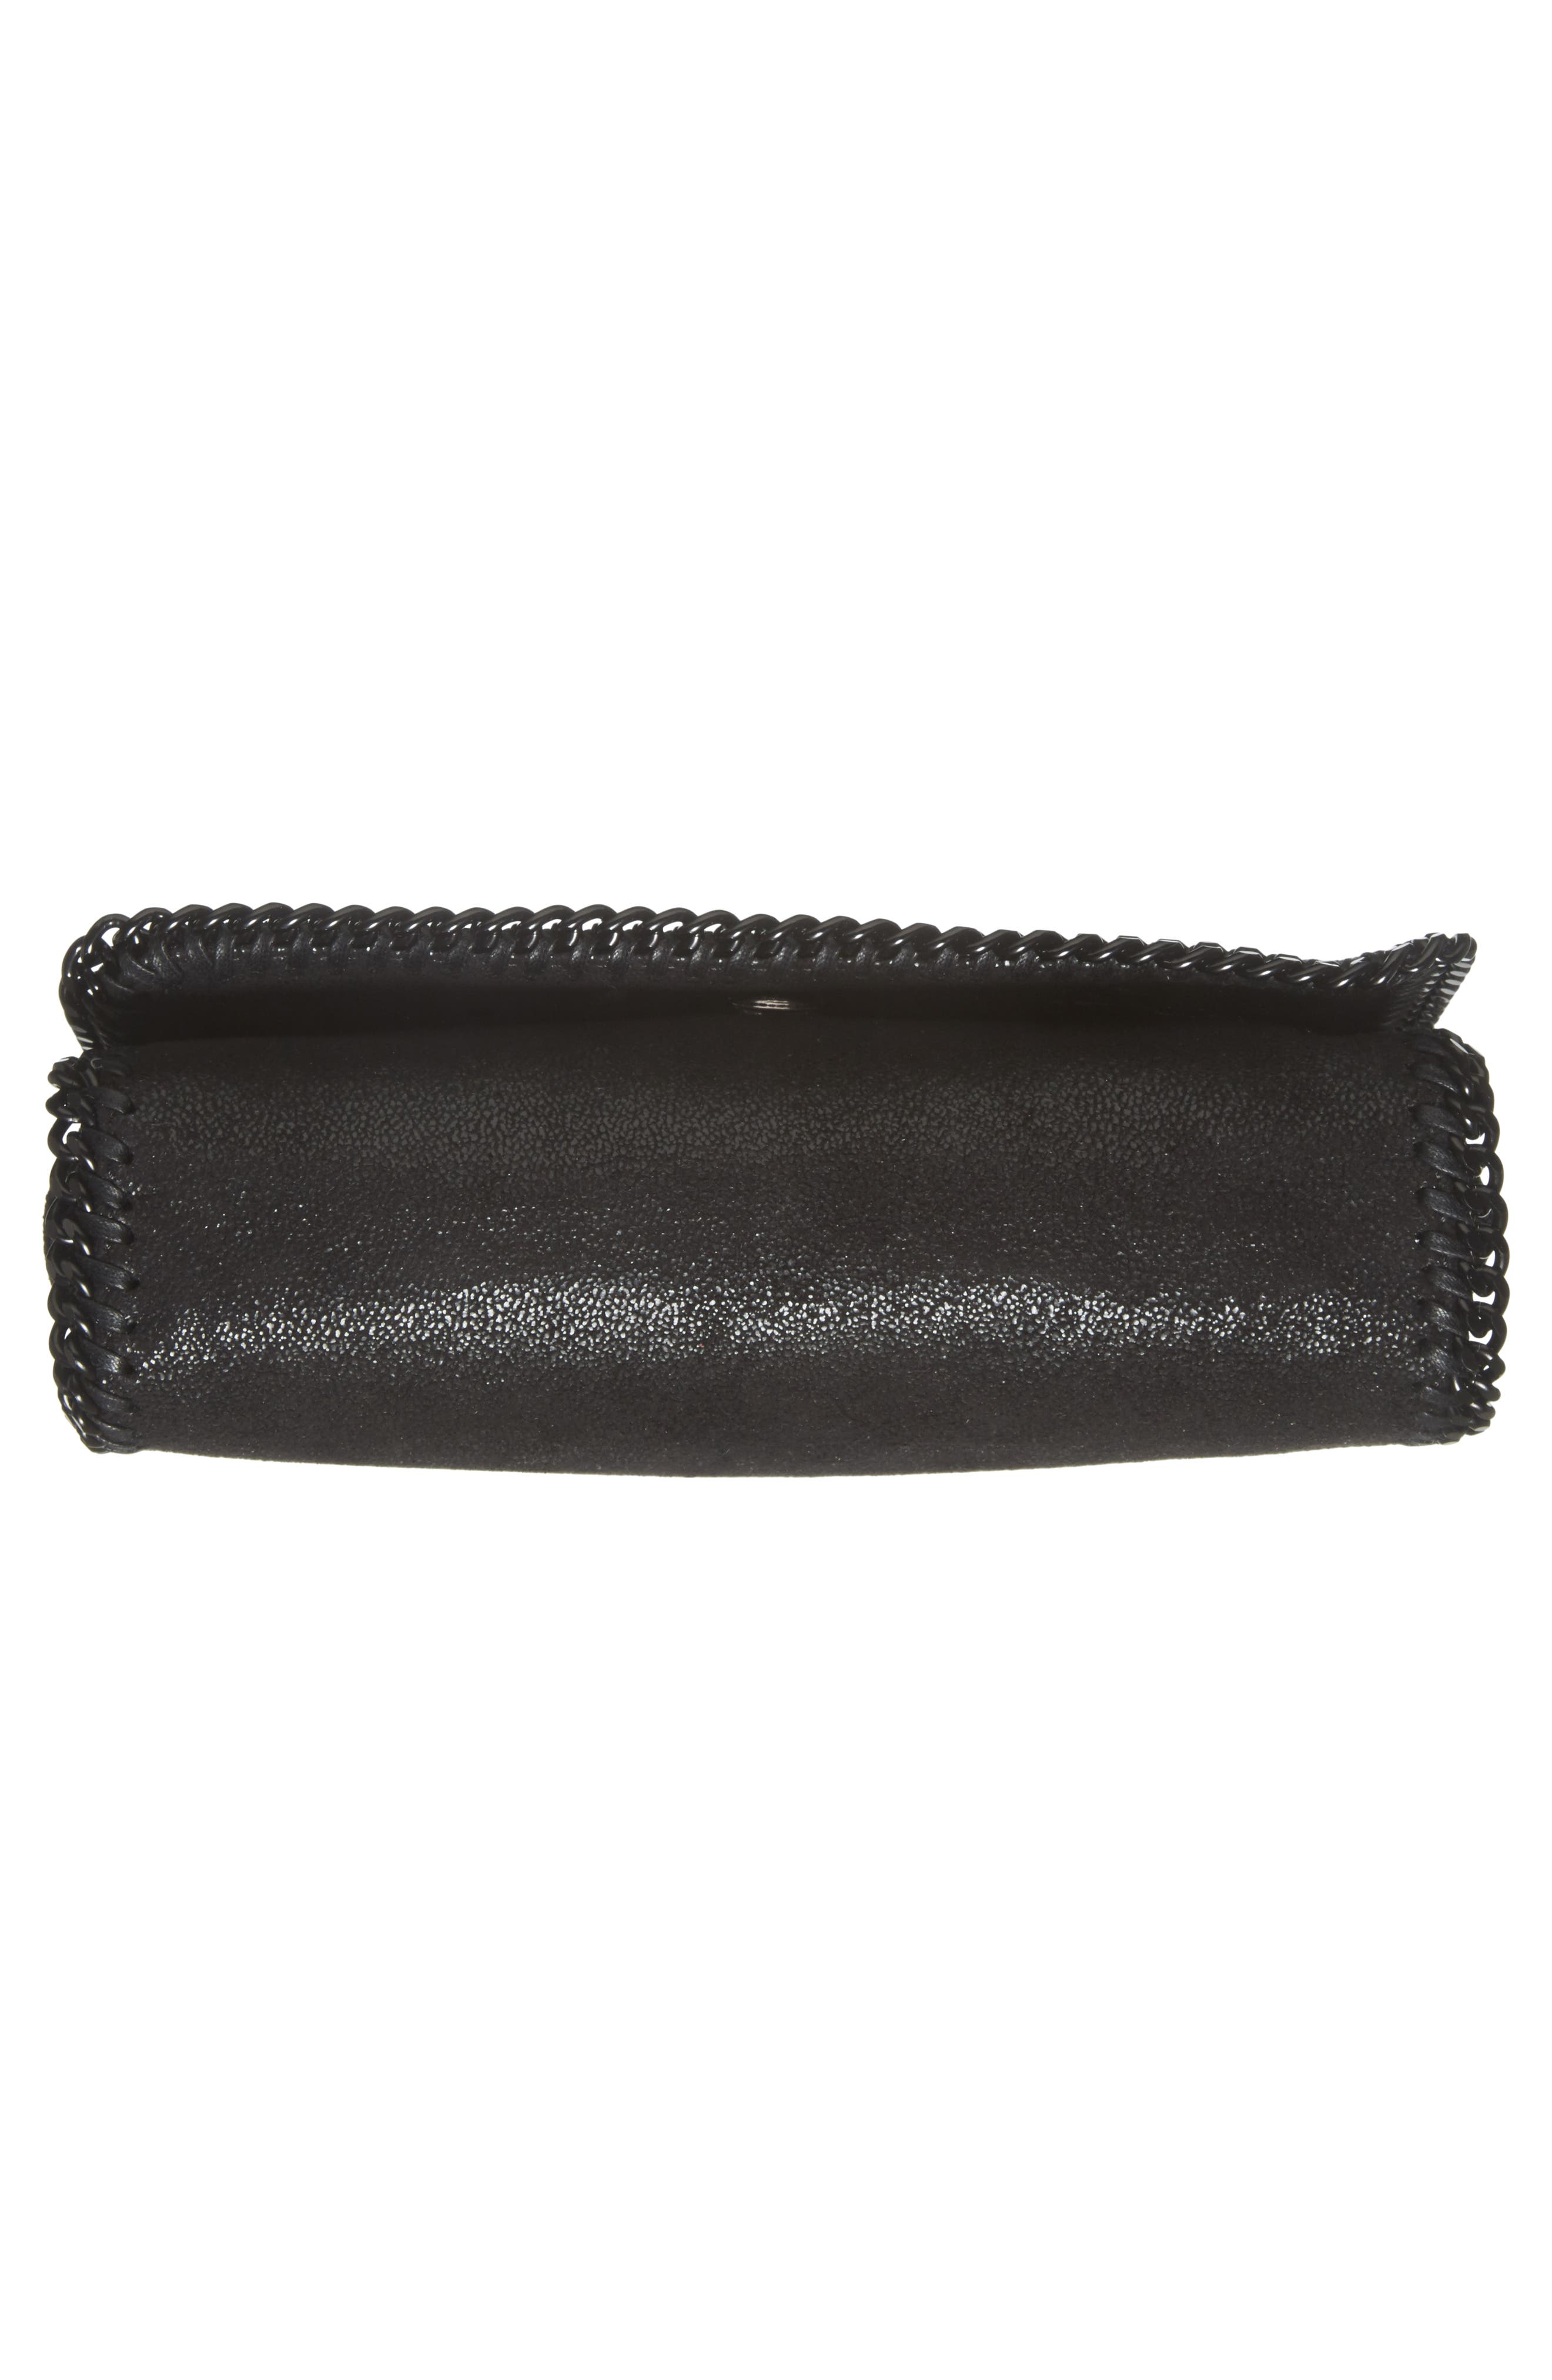 Falabella Shaggy Deer Faux Leather Clutch,                             Alternate thumbnail 6, color,                             BLACK OUT